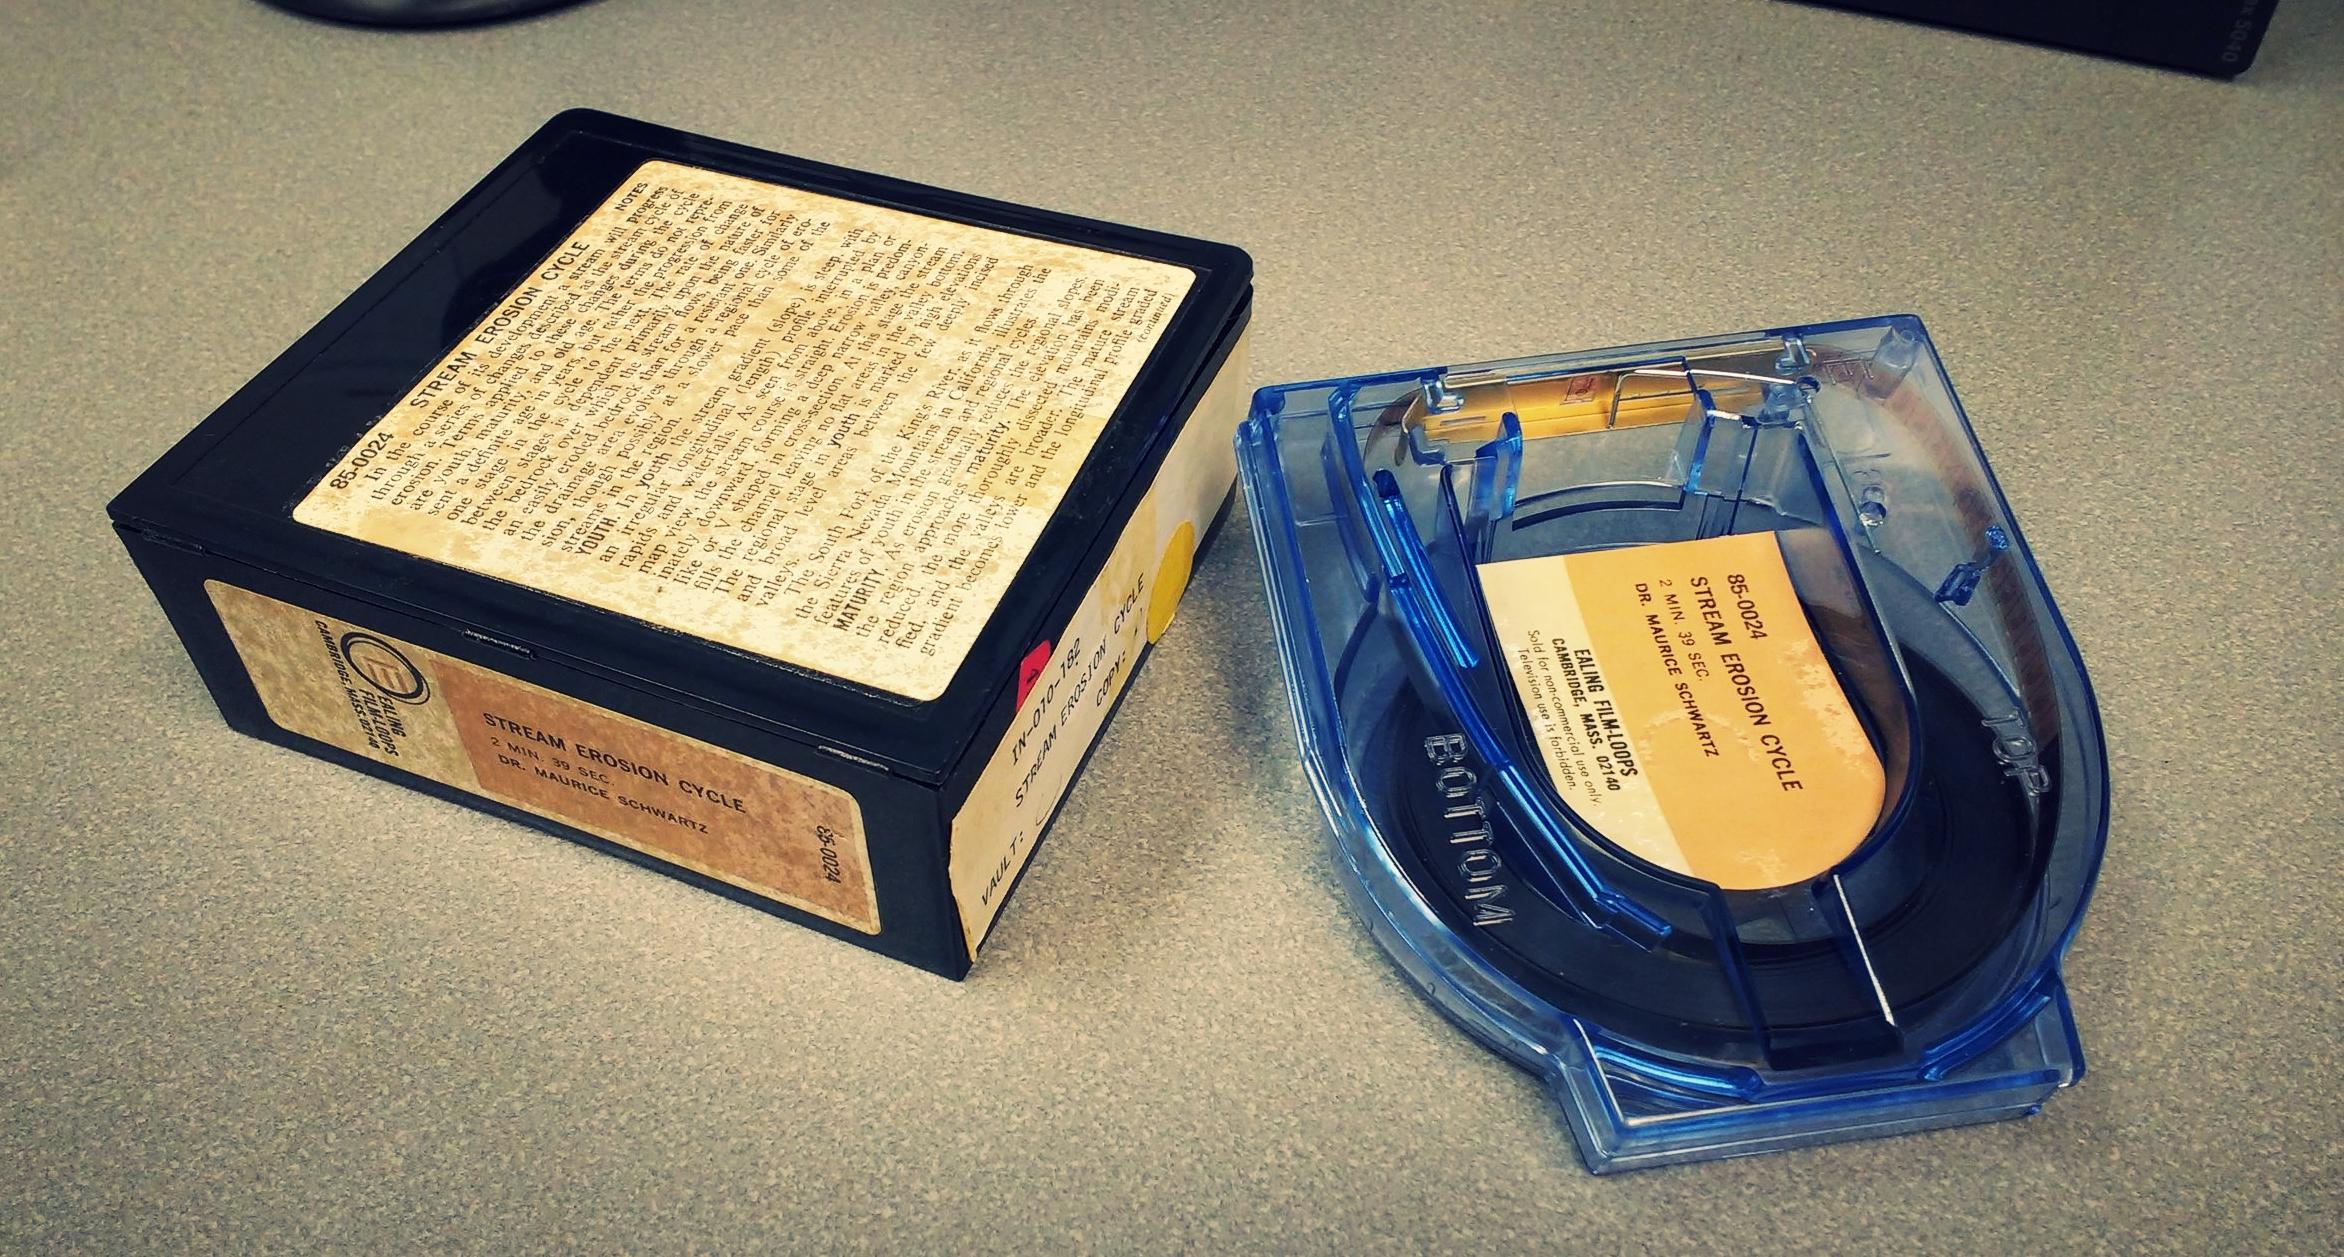 8mm educational film cartridge